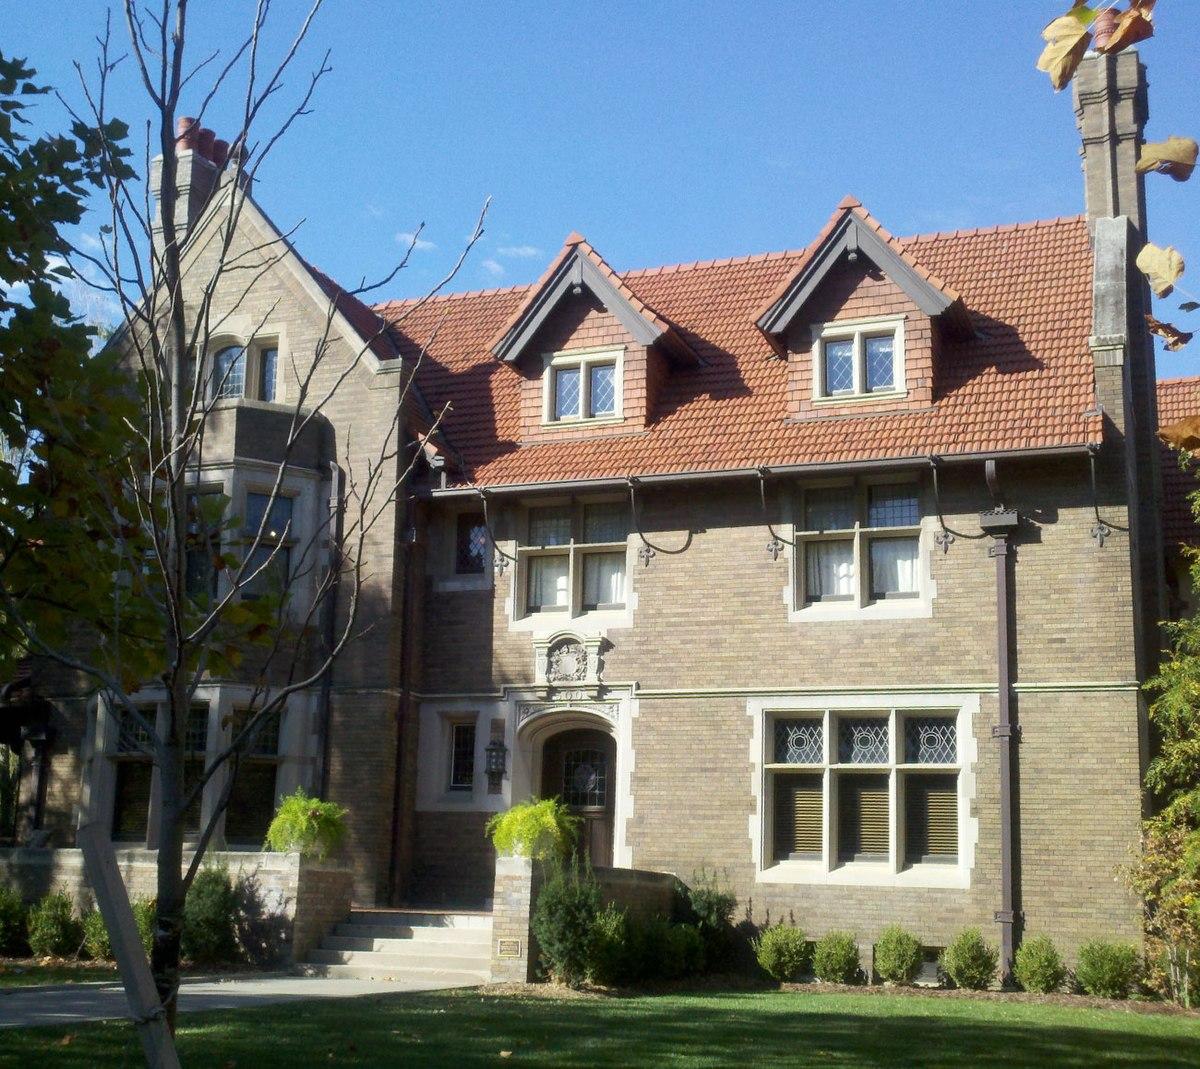 Millard House brandeis–millard house - wikipedia